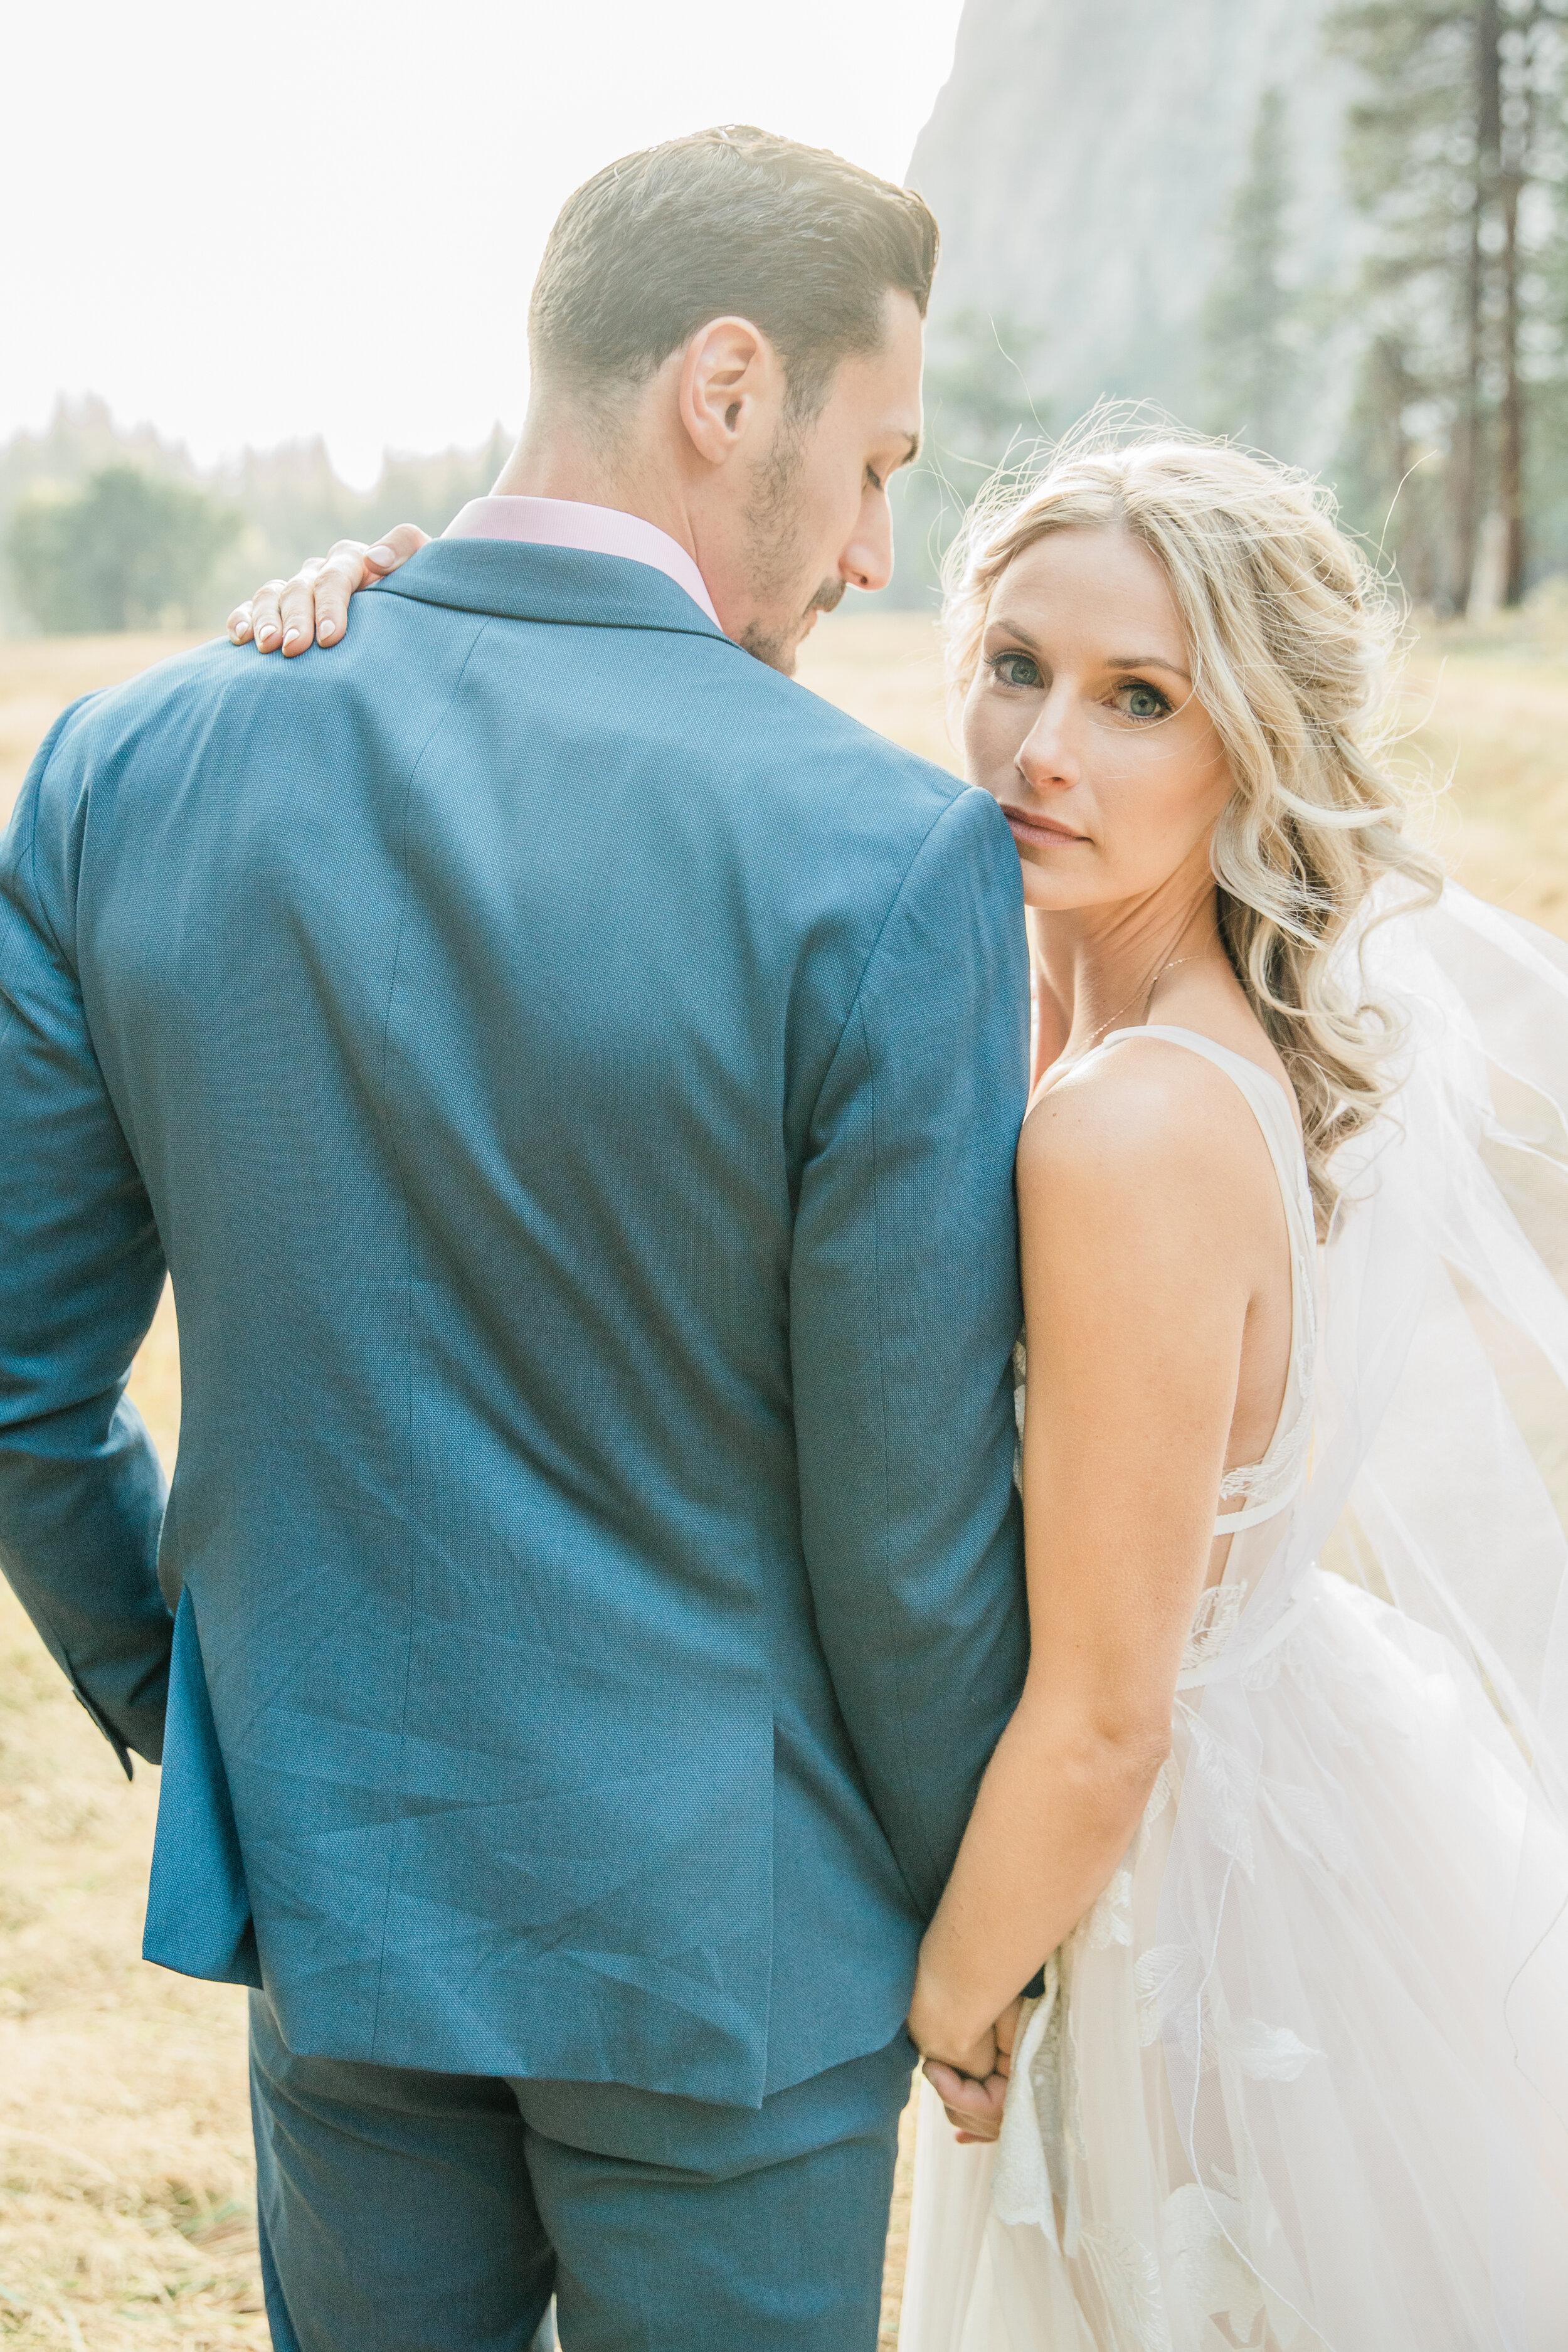 Leanne and Joe - Married - Sneak Peeks - Lauren Alisse Photography-37.jpg